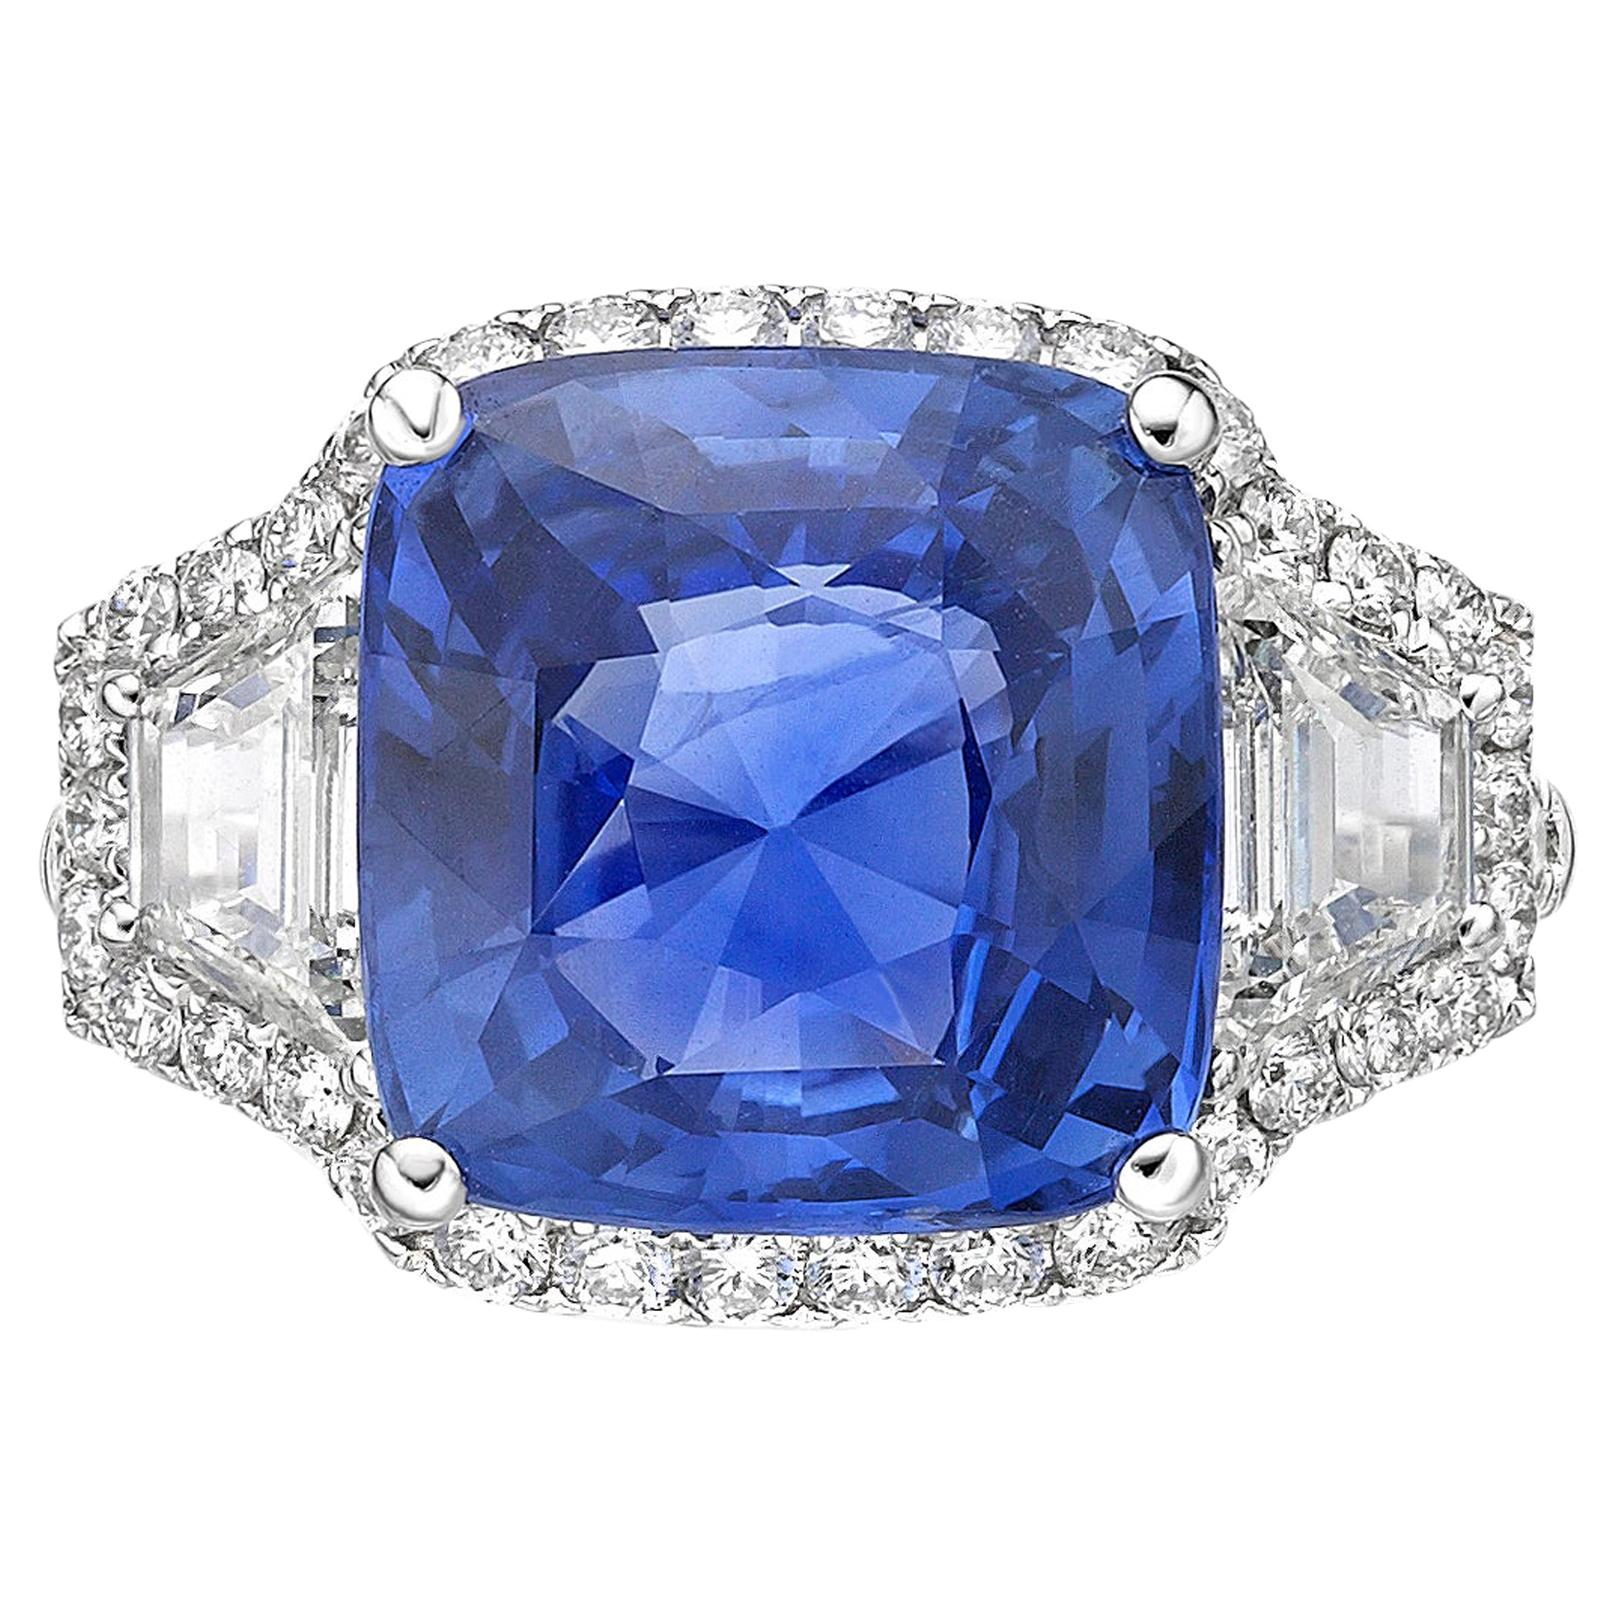 9.16 Carat Sapphire Sri Lanka  GRS Certified Unheated Ceylon Ring Cushion Cut